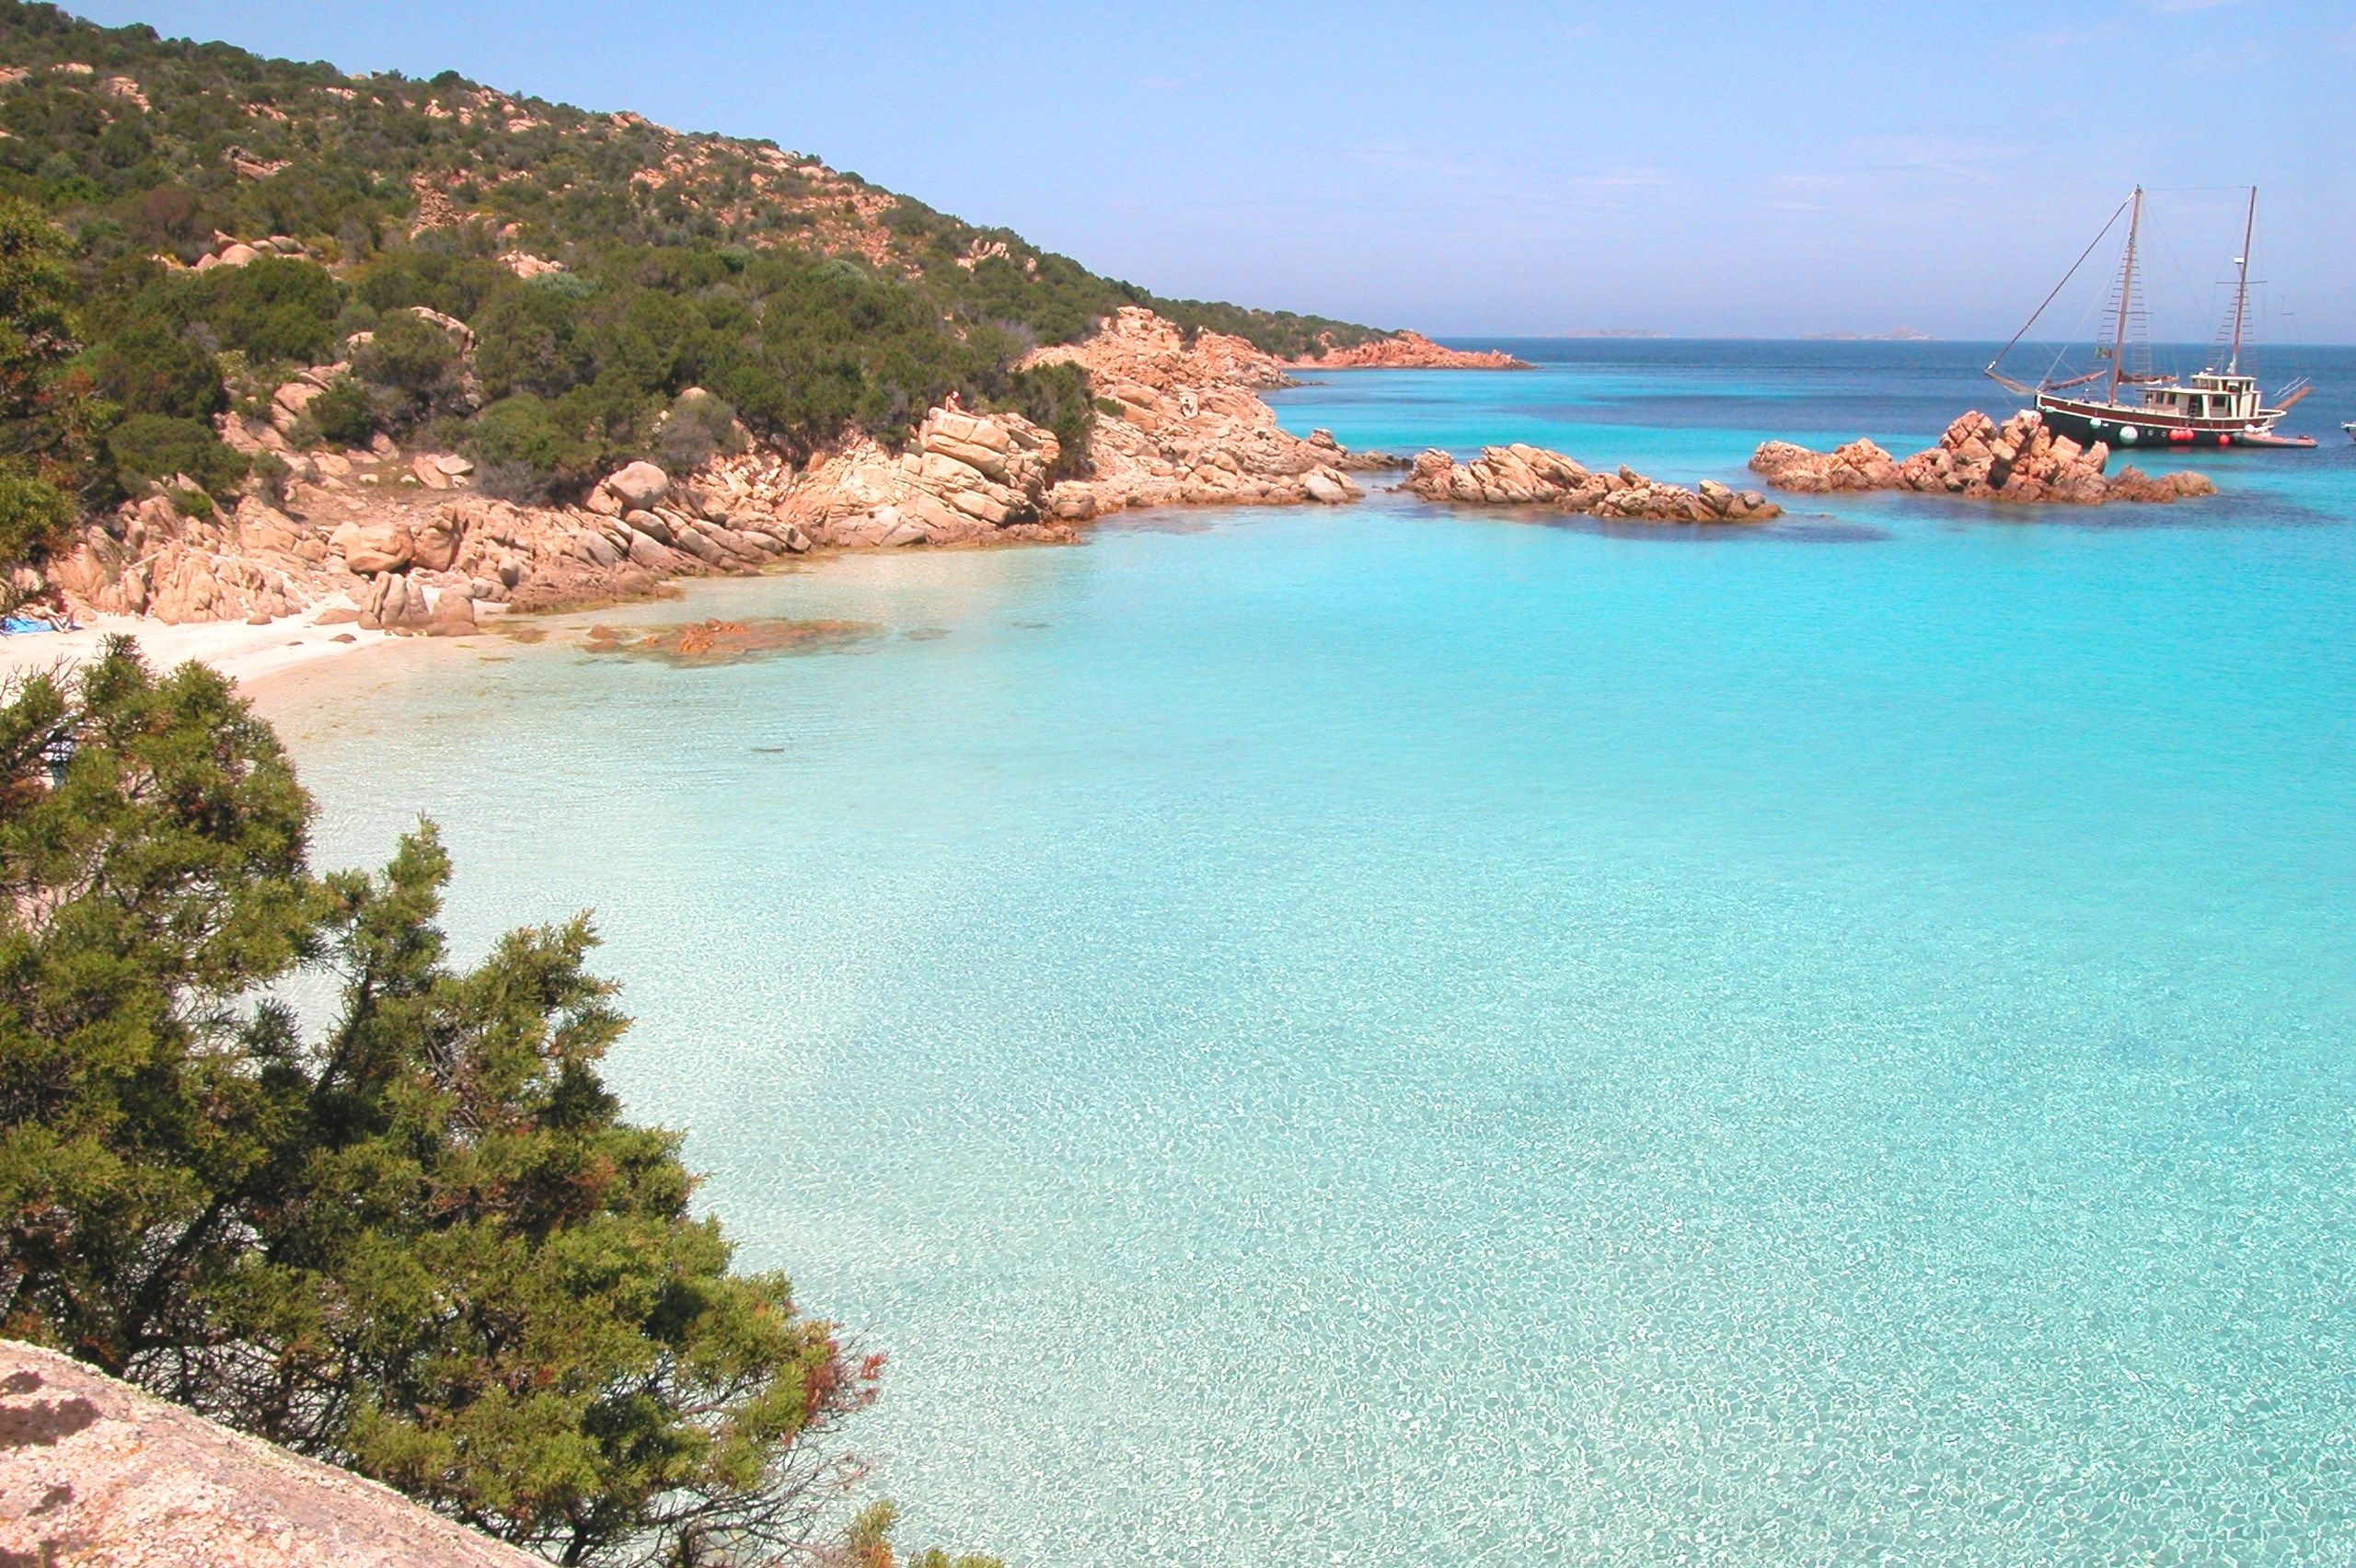 #Arcipelago #LaMaddalena #Sardegna #delphinahotels